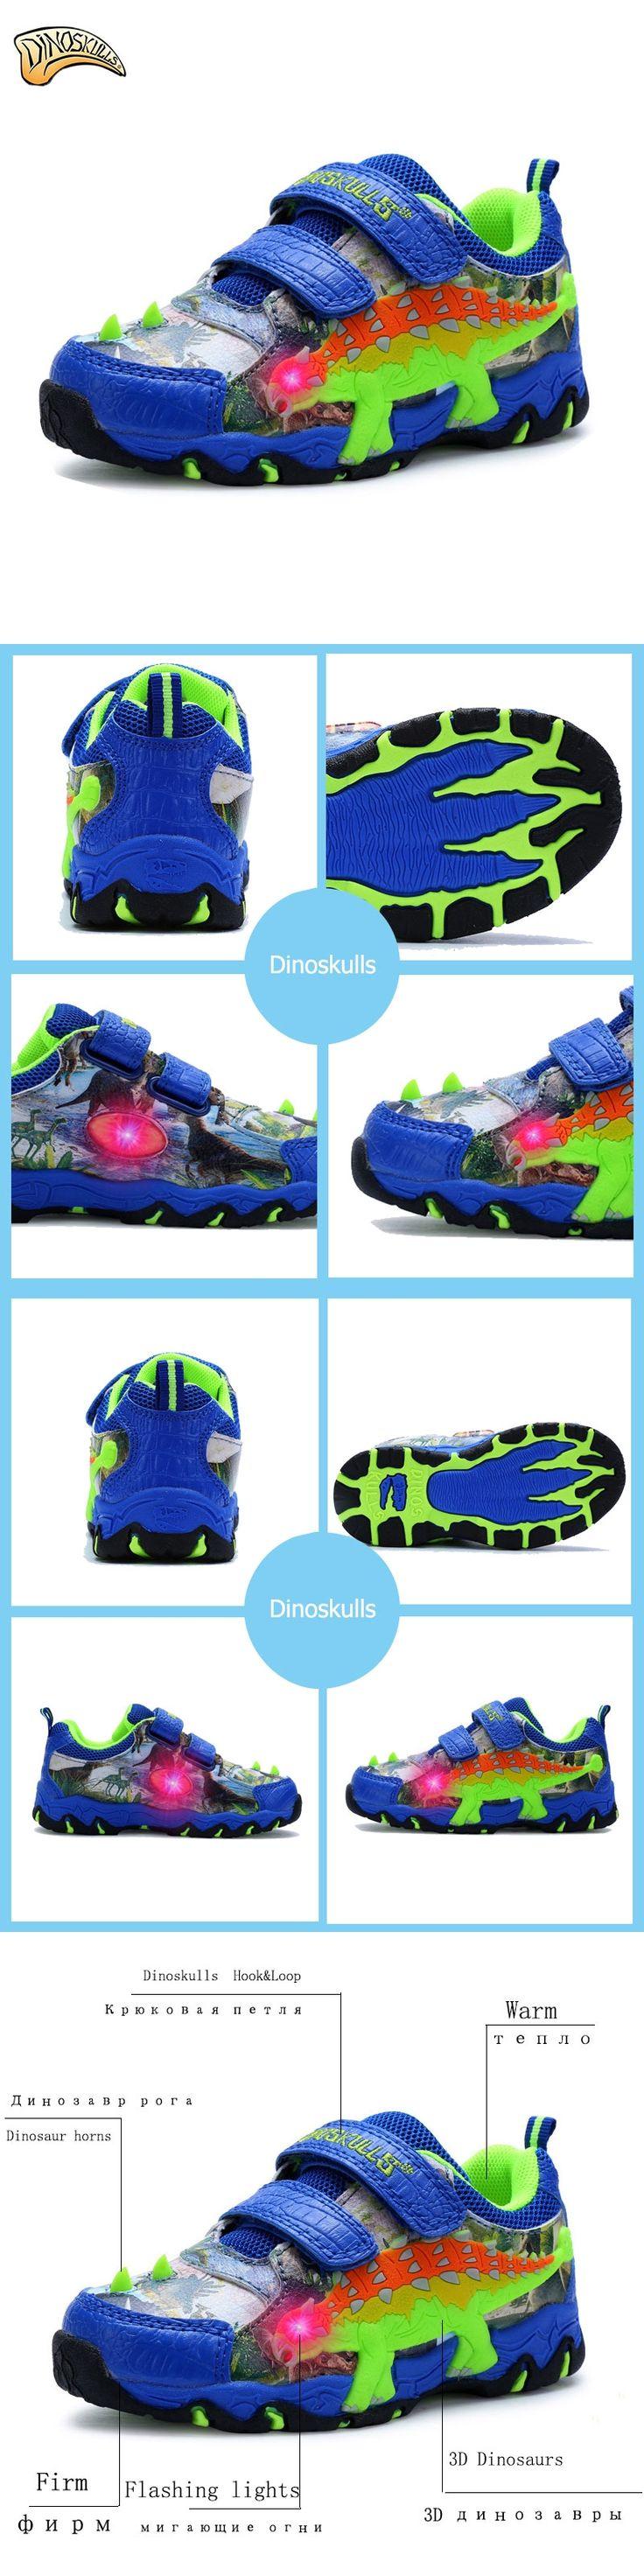 Dinoskulls New Summer Kids Sport Shoes Children Sneakers Breathable Tenis Led Lights Boys Running Shoes 3D Dinosaur Shoes 27-34